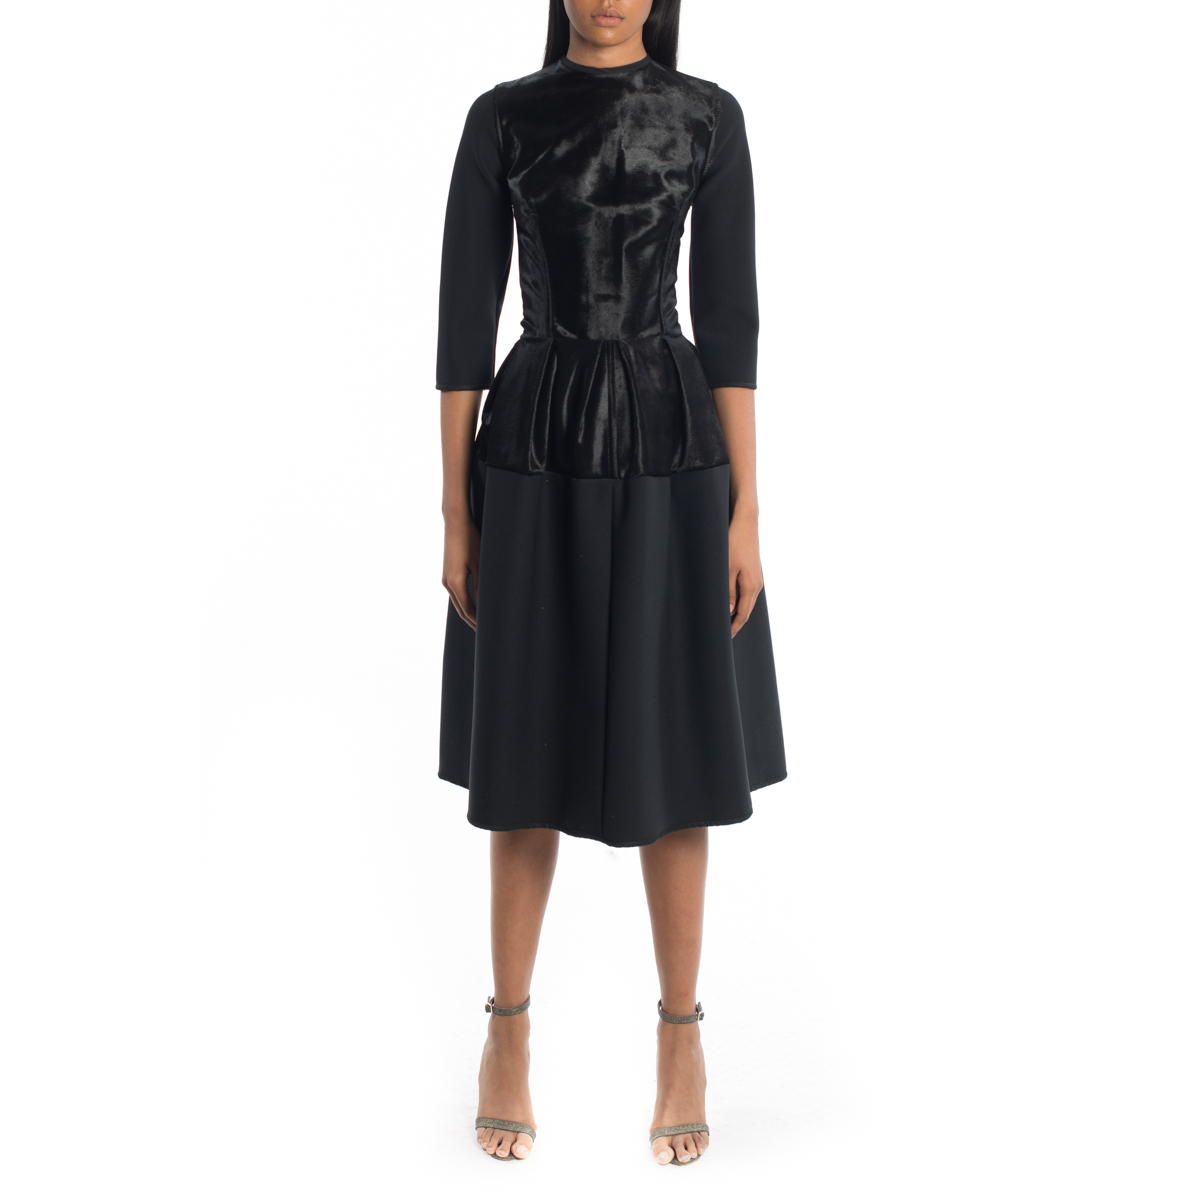 Crown Heights Dress